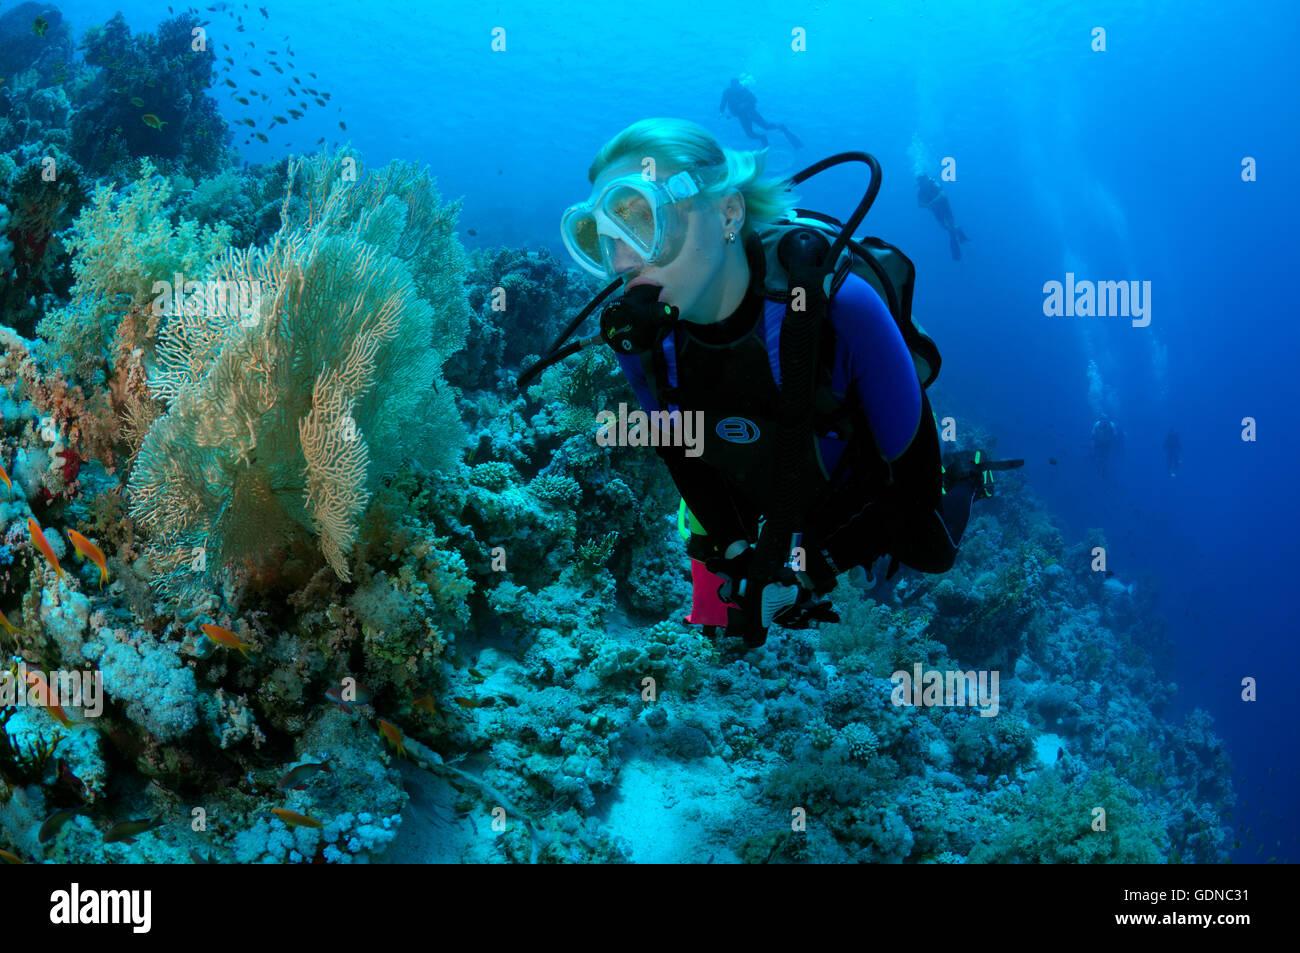 Female Scuba diver looking at the plumbings on the Shark Yolanda reef, Ras Mohammed national park, Sinai - Stock Image